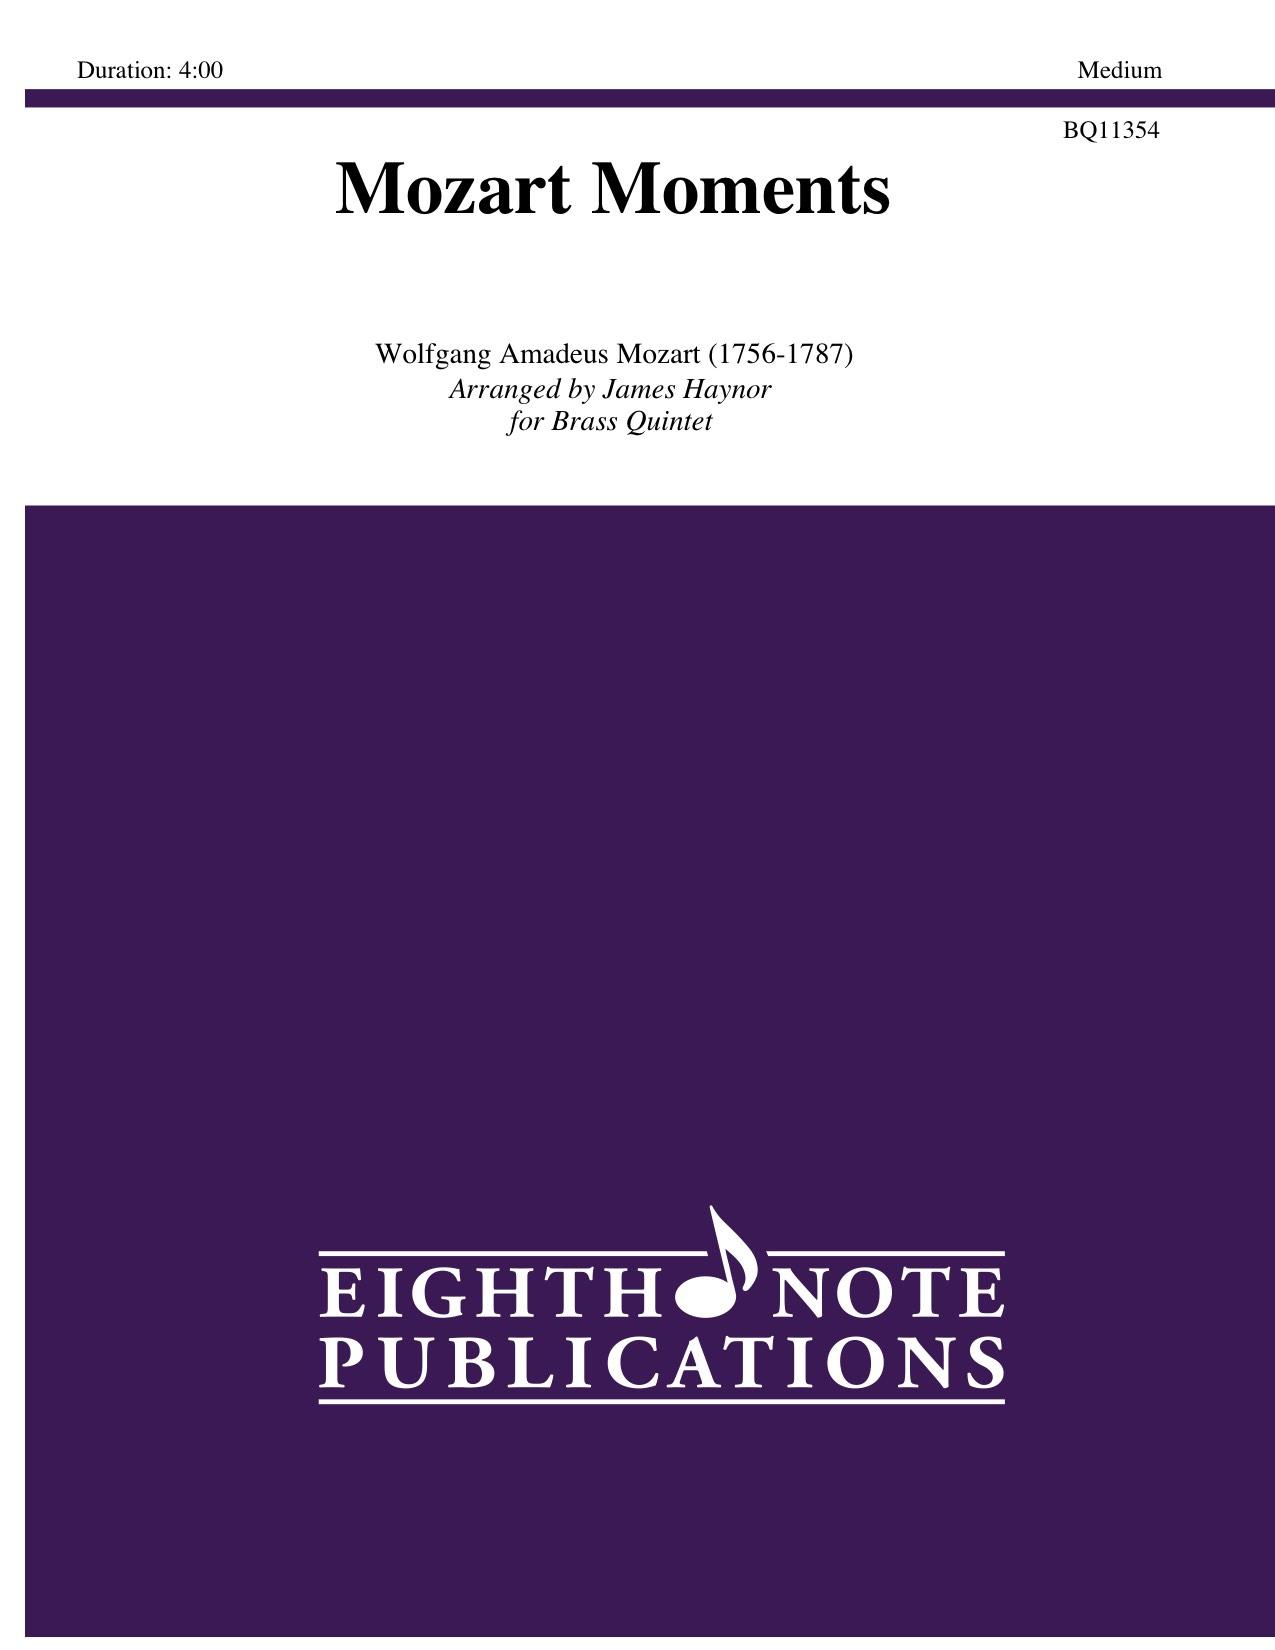 Mozart Moments - Wolfgang Amadeus Mozart